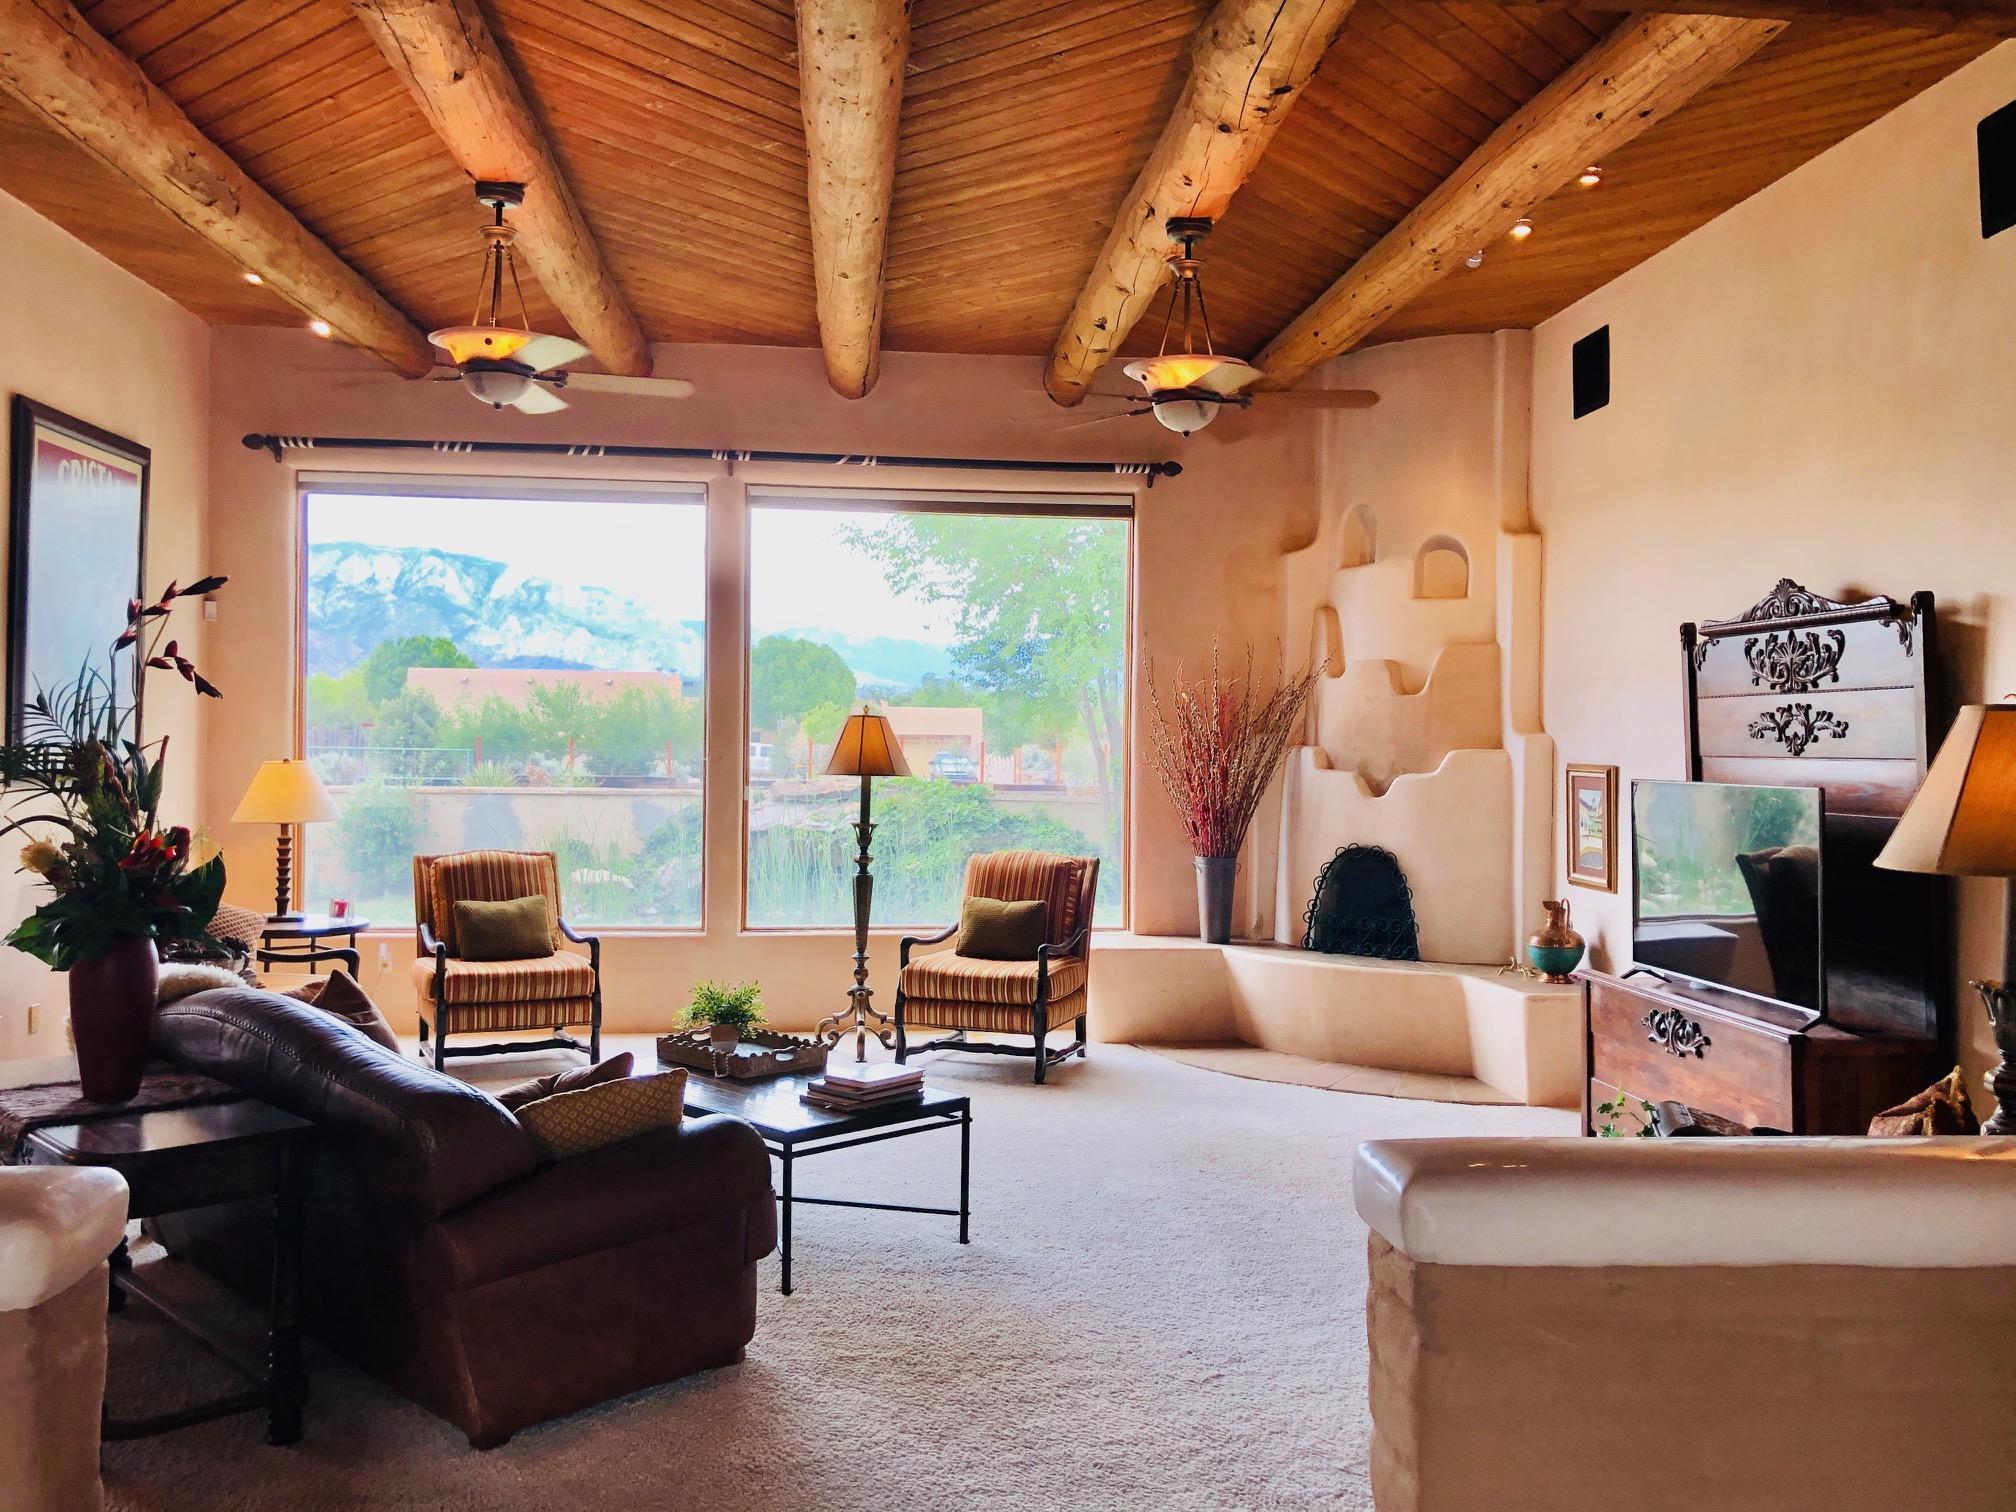 126 DE SILVA Road, Corrales, NM 87048 - Corrales, NM real estate listing